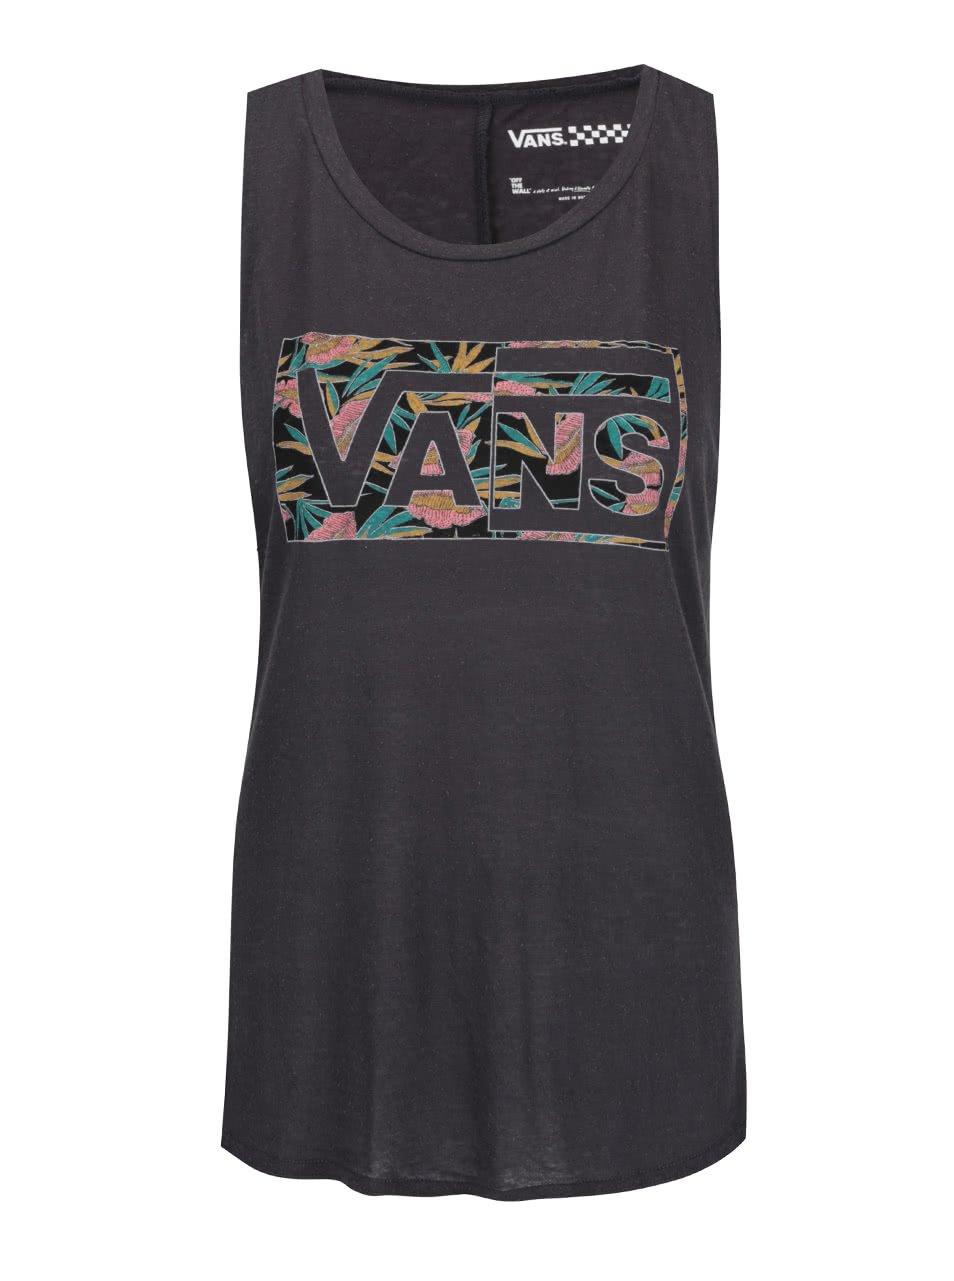 Tmavě šedé dámské tílko s barevným nápisem Vans Tropical Blast